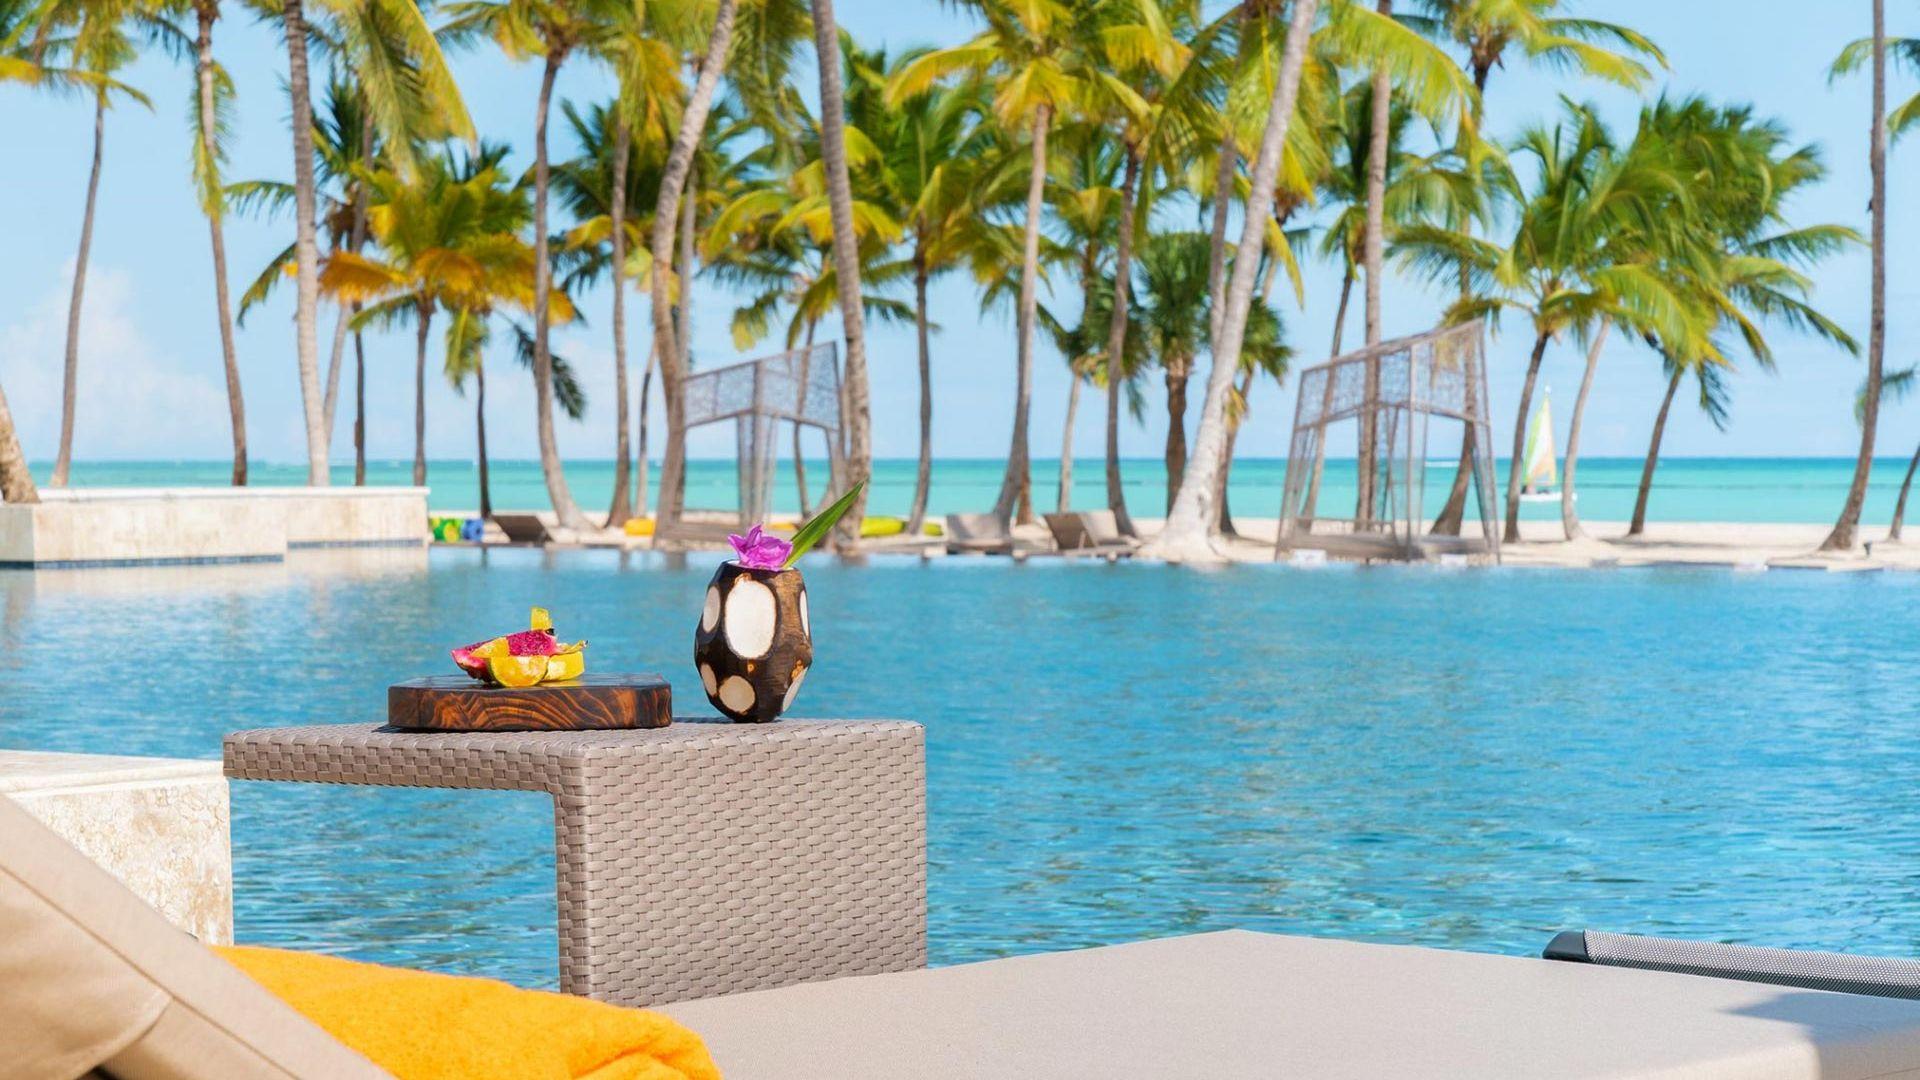 Craciun 2021 - Sejur charter Hyatt Resort Punta Cana, 9 zile